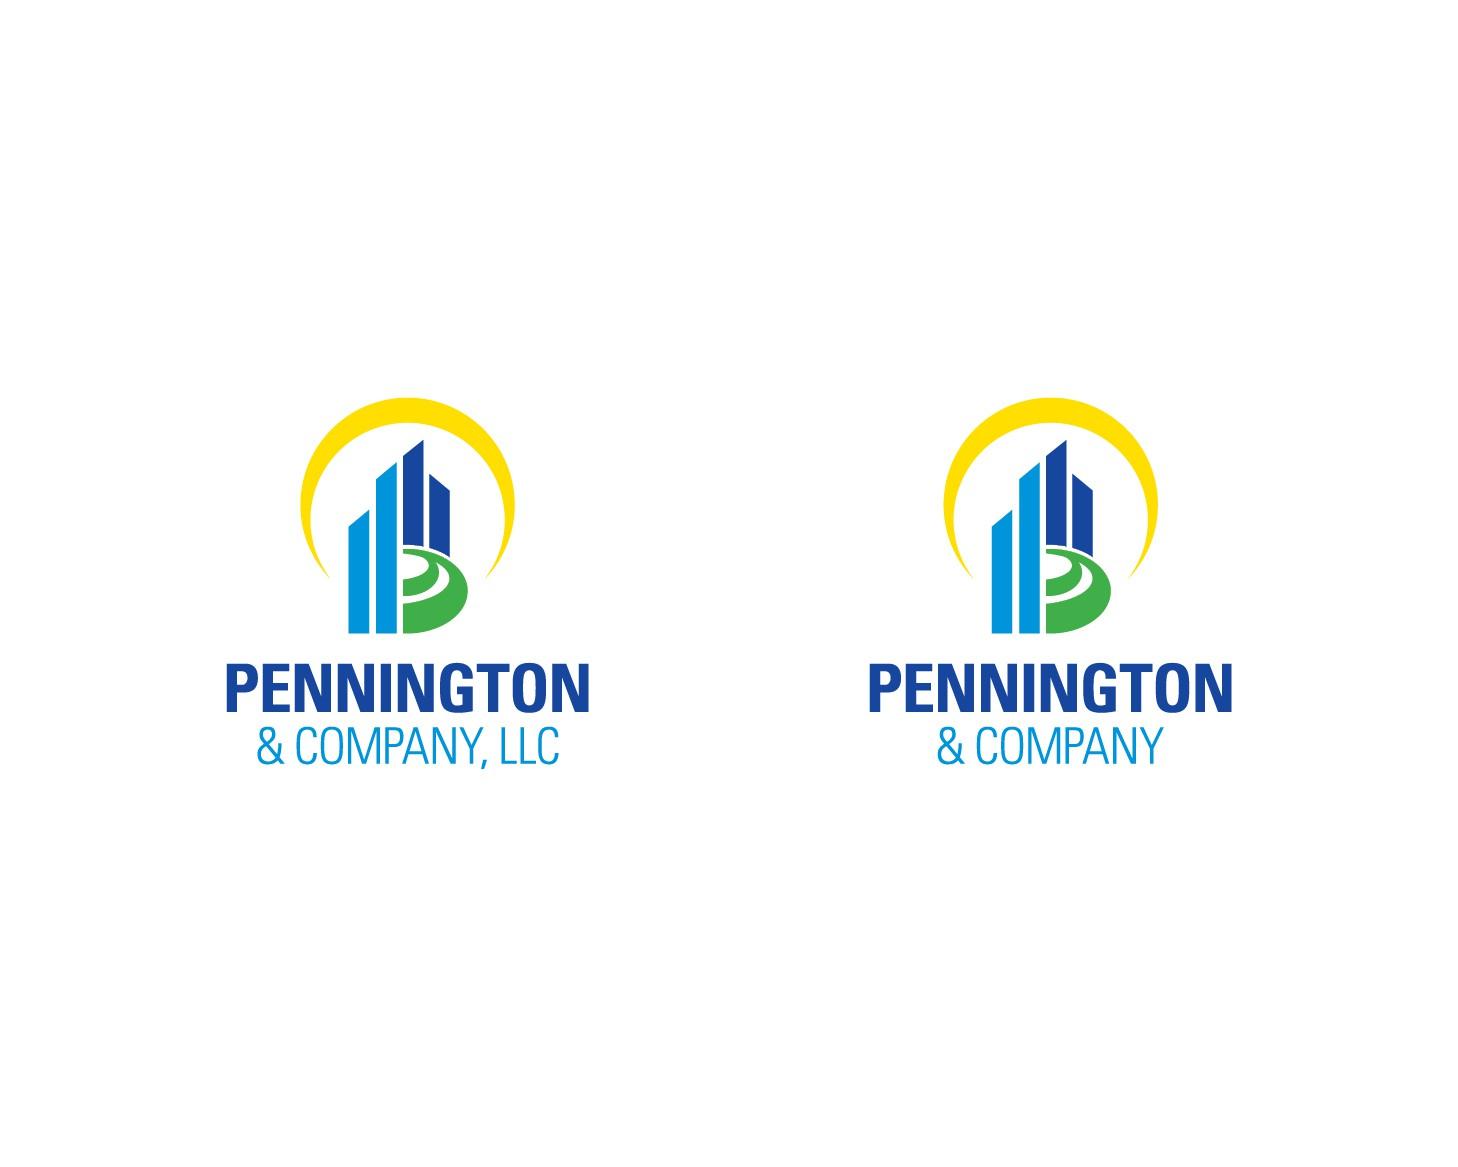 Help Pennington & Company with a new logo